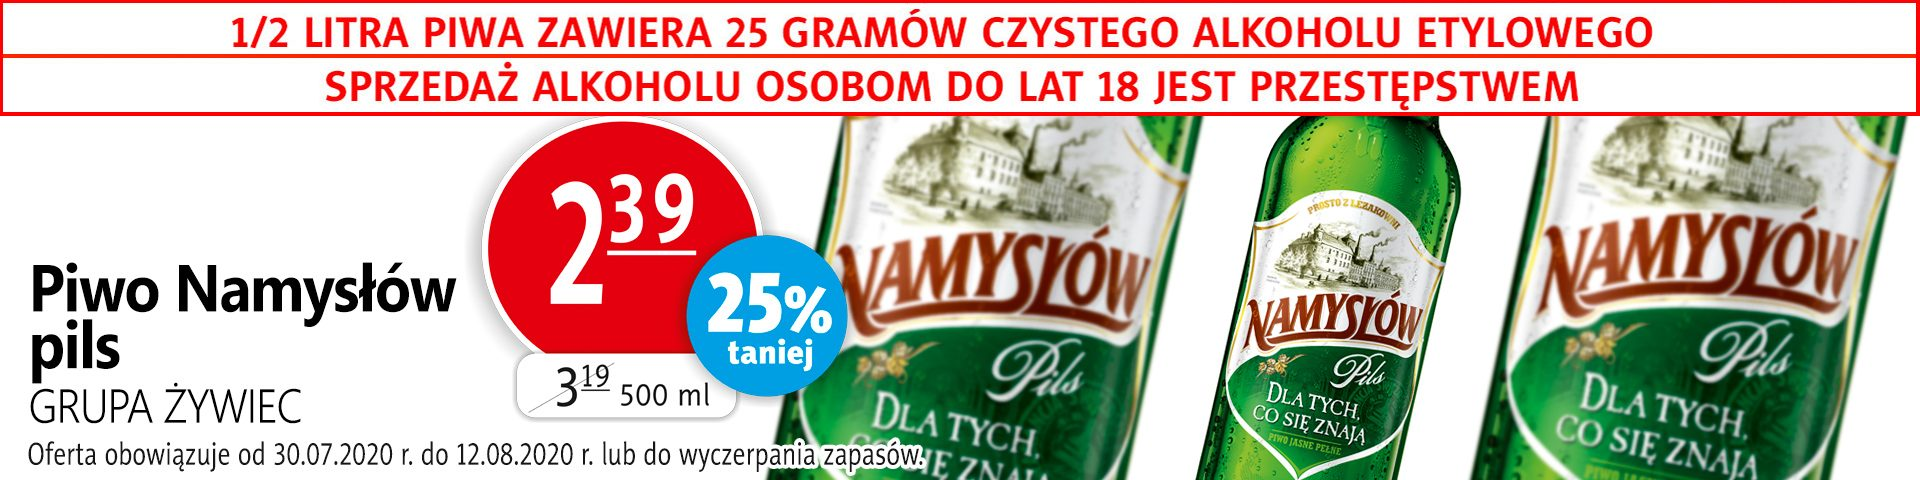 billbord_30_07-12..08.2020_namyslow